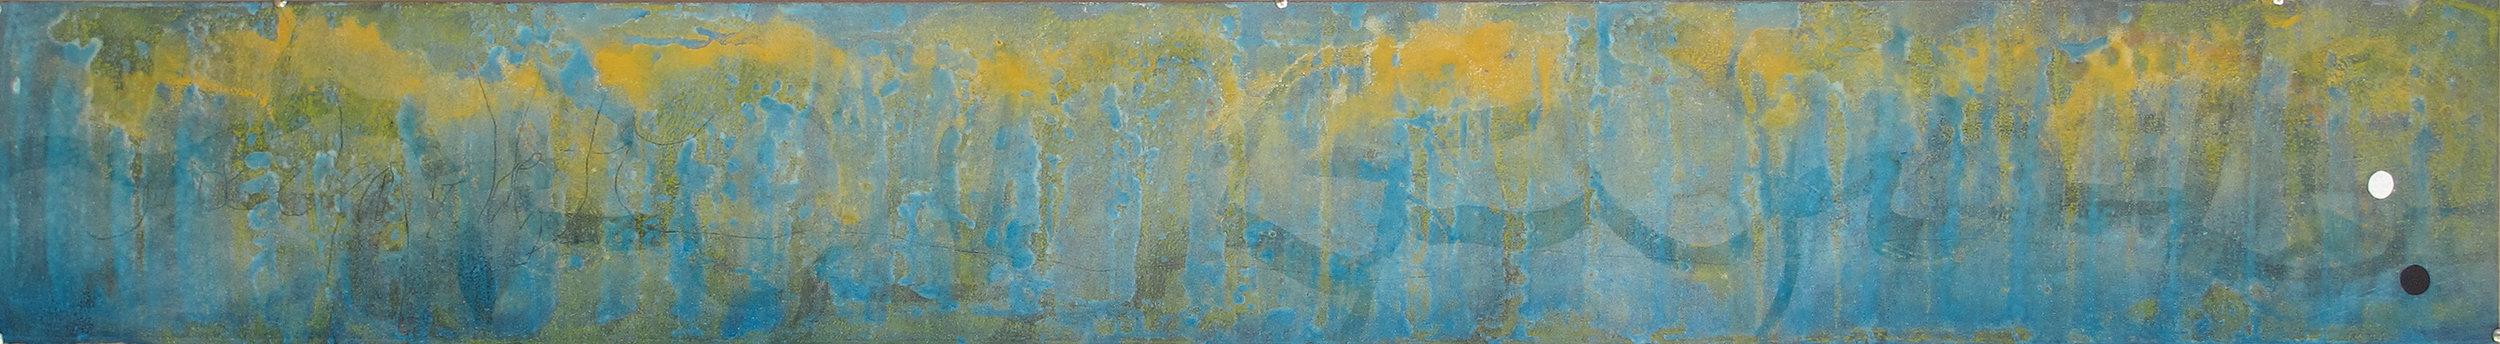 Sense títol  , pintura sobre paper Velin Arches, 198 x 28 centímetres. 2011